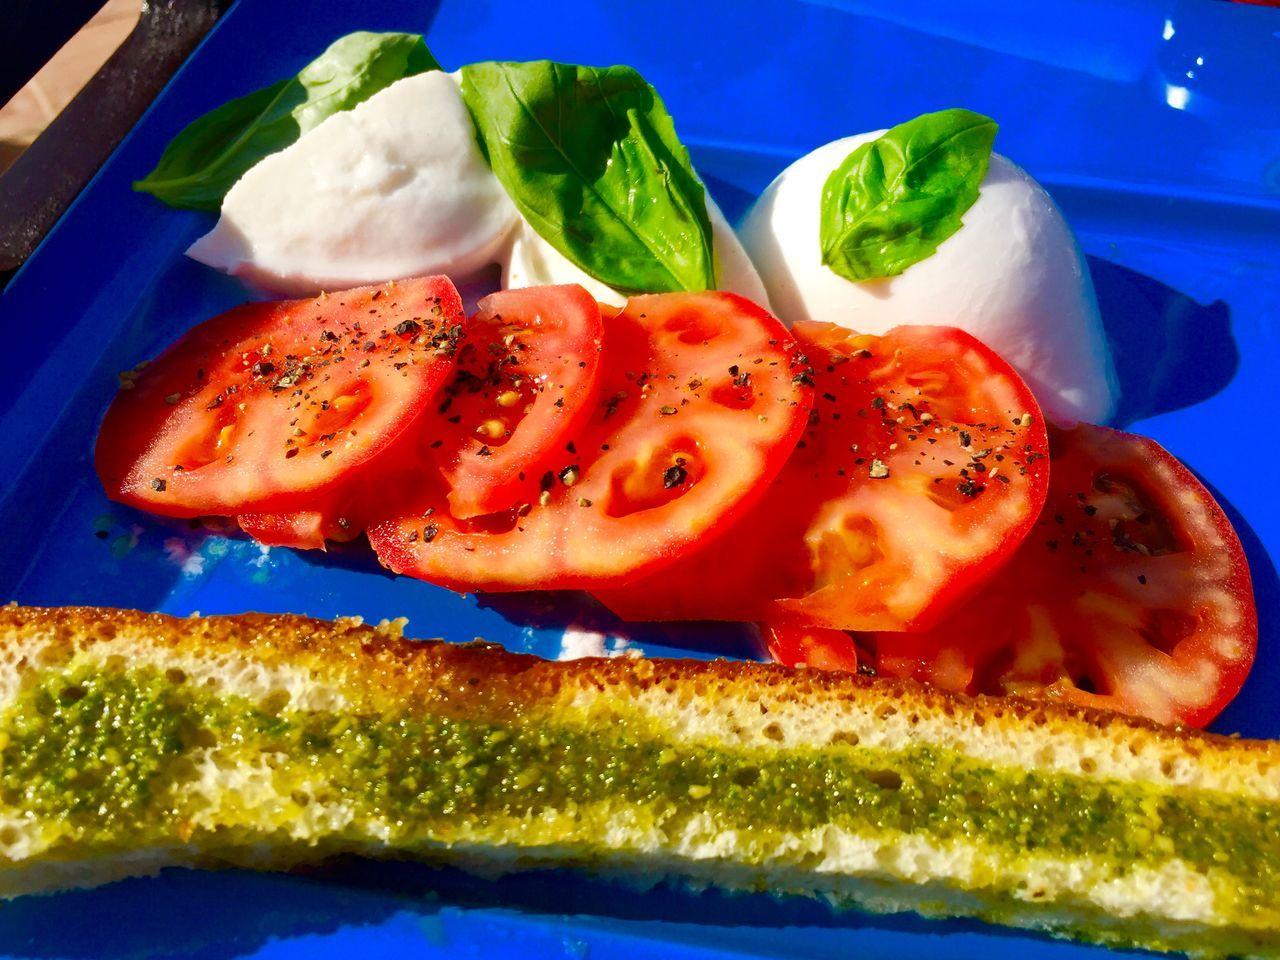 Tomato & monzarella salad Lunch Food Salad Tomato Monzarella Food Porn Shagrilaresidence Abudhabi Abu Dhabi United Arab Emirates